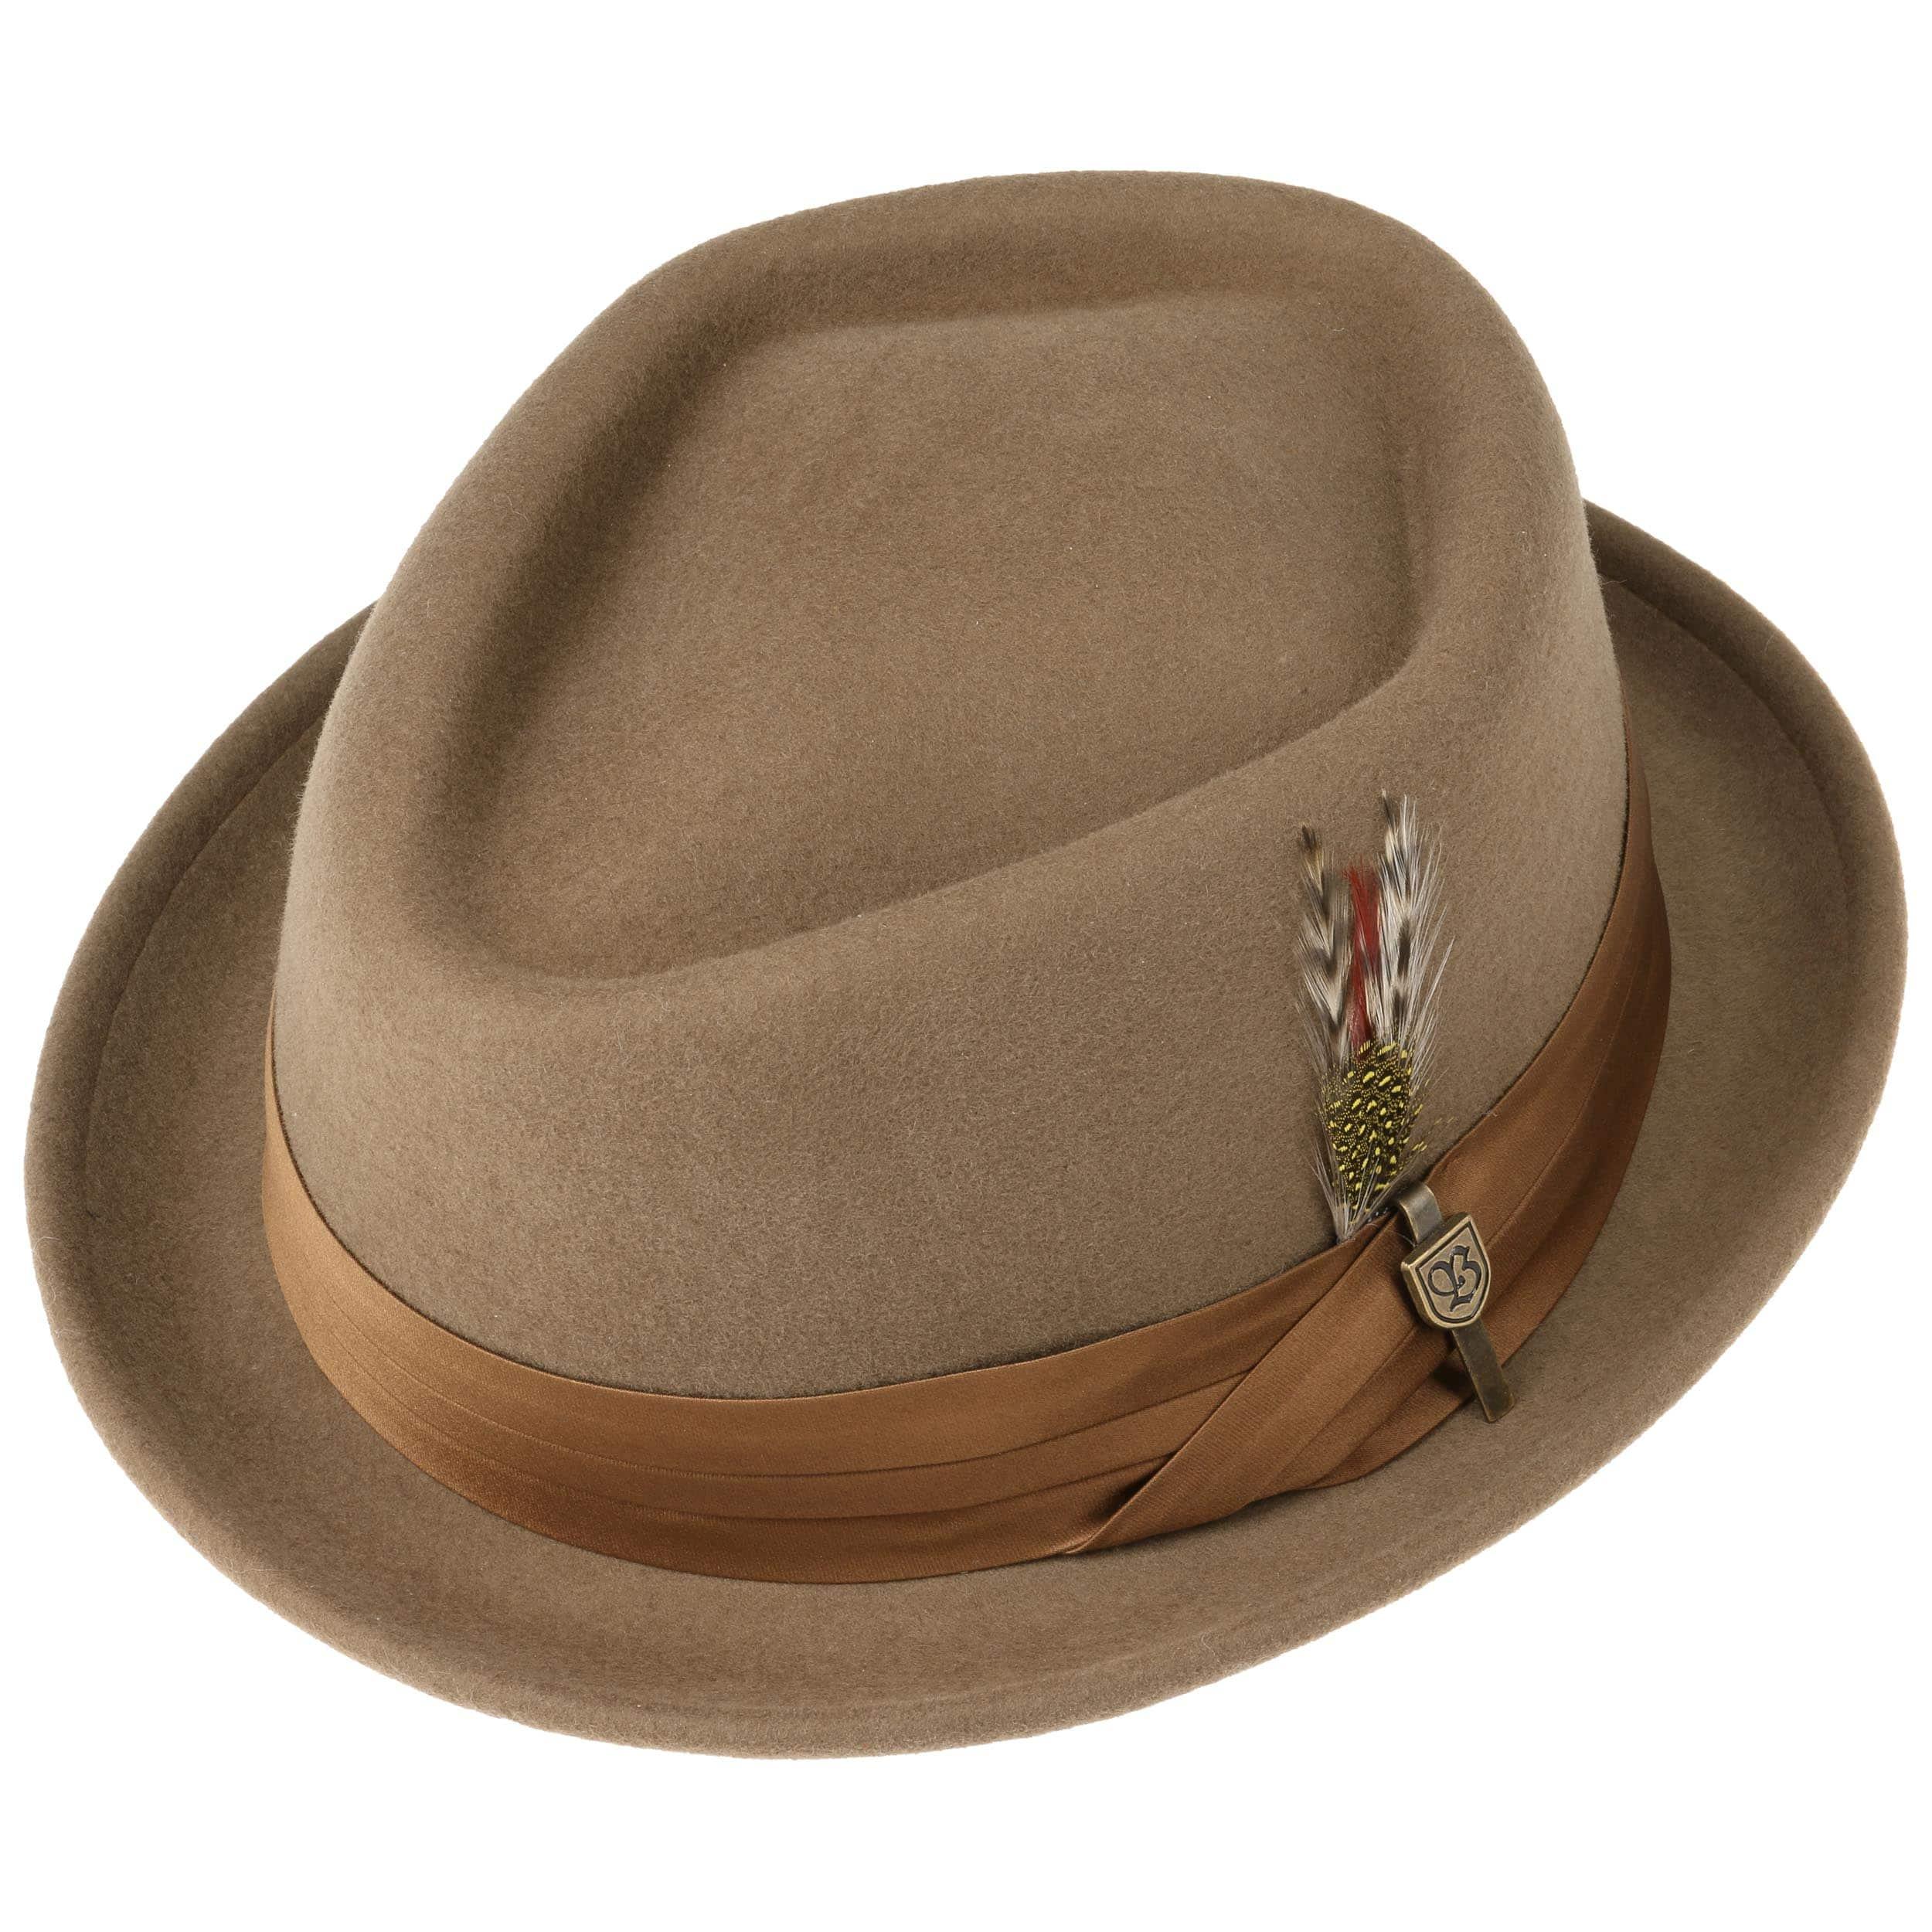 8e859c3746e ... Stout Pork Pie Wool Felt Hat by Brixton - black 2 ...